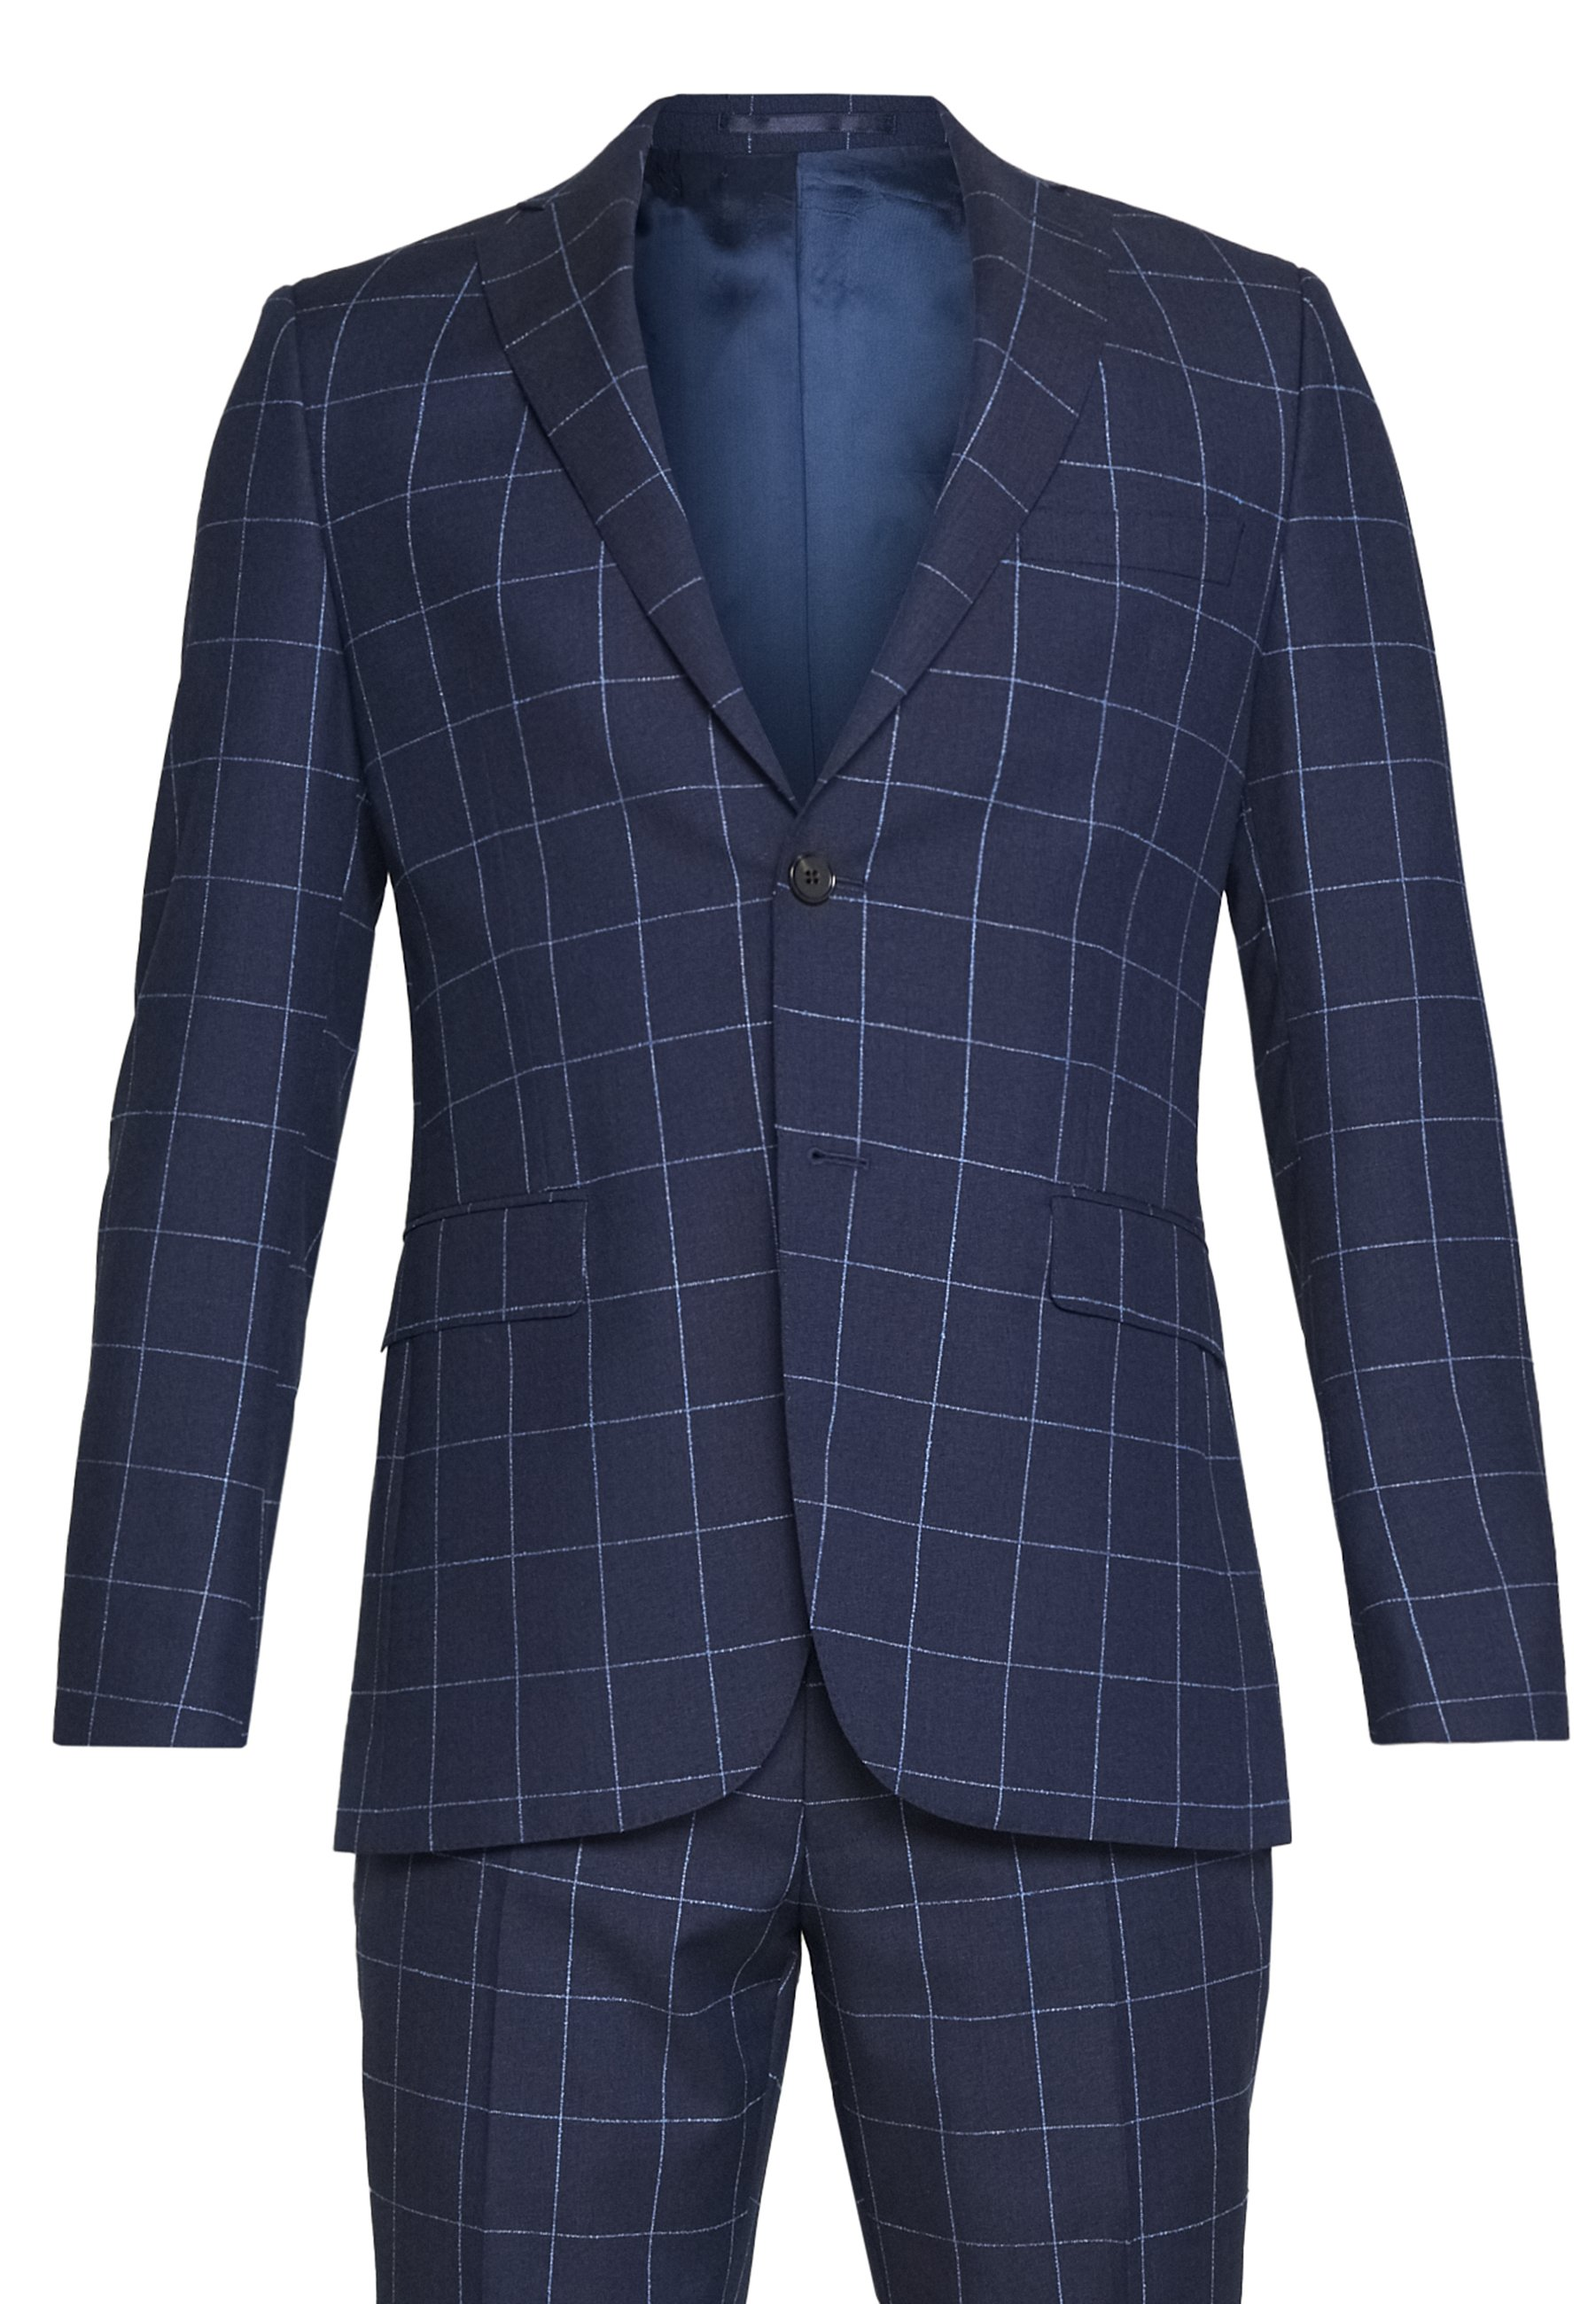 Michael Kors SLIM FIT CHECK SUIT SET - Costume - navy